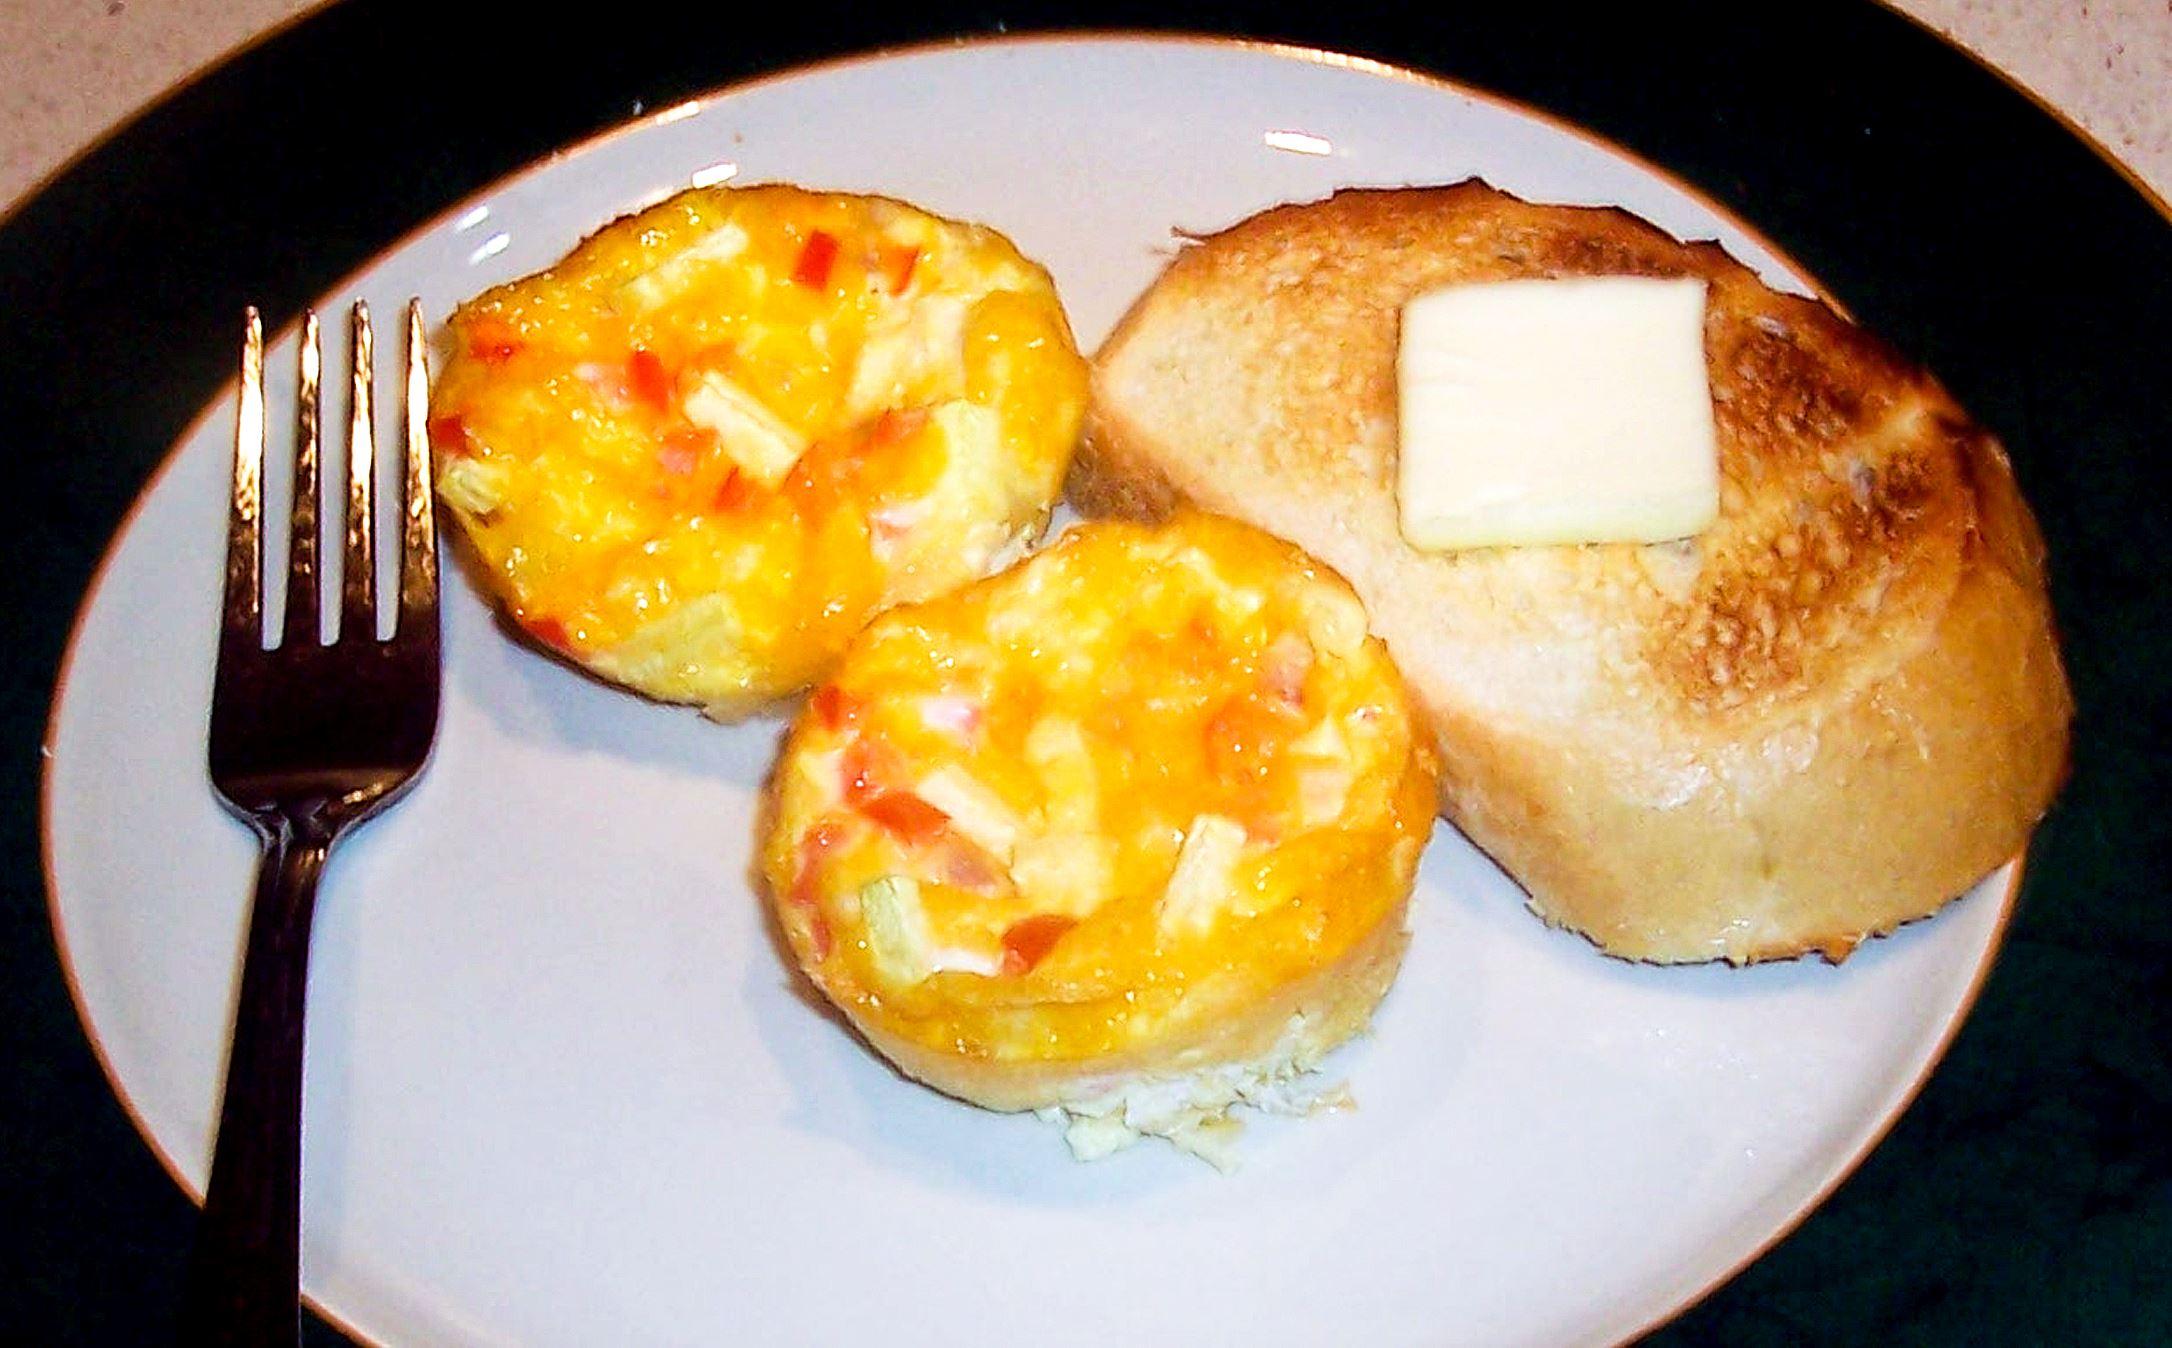 20140806hofritatasfood Muffin Frittatas.